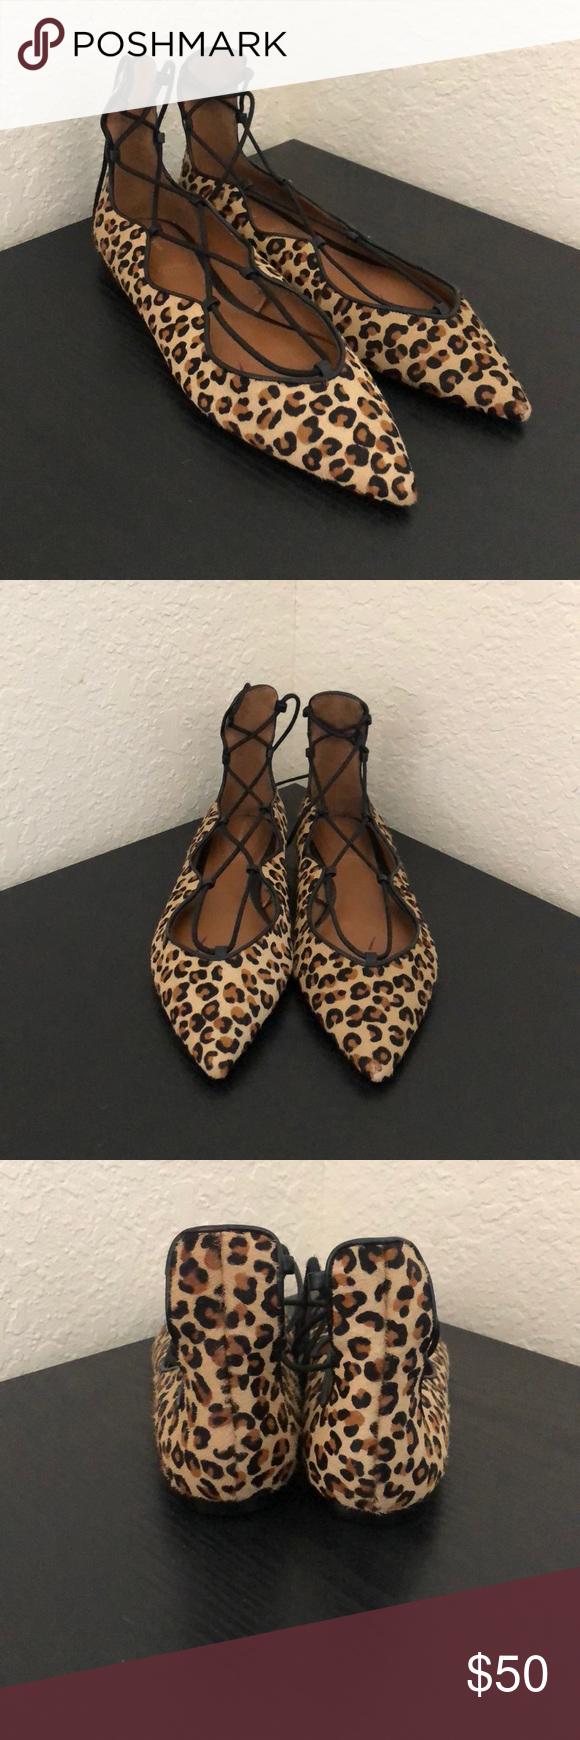 Zara Leopard Flats | Leopard flats